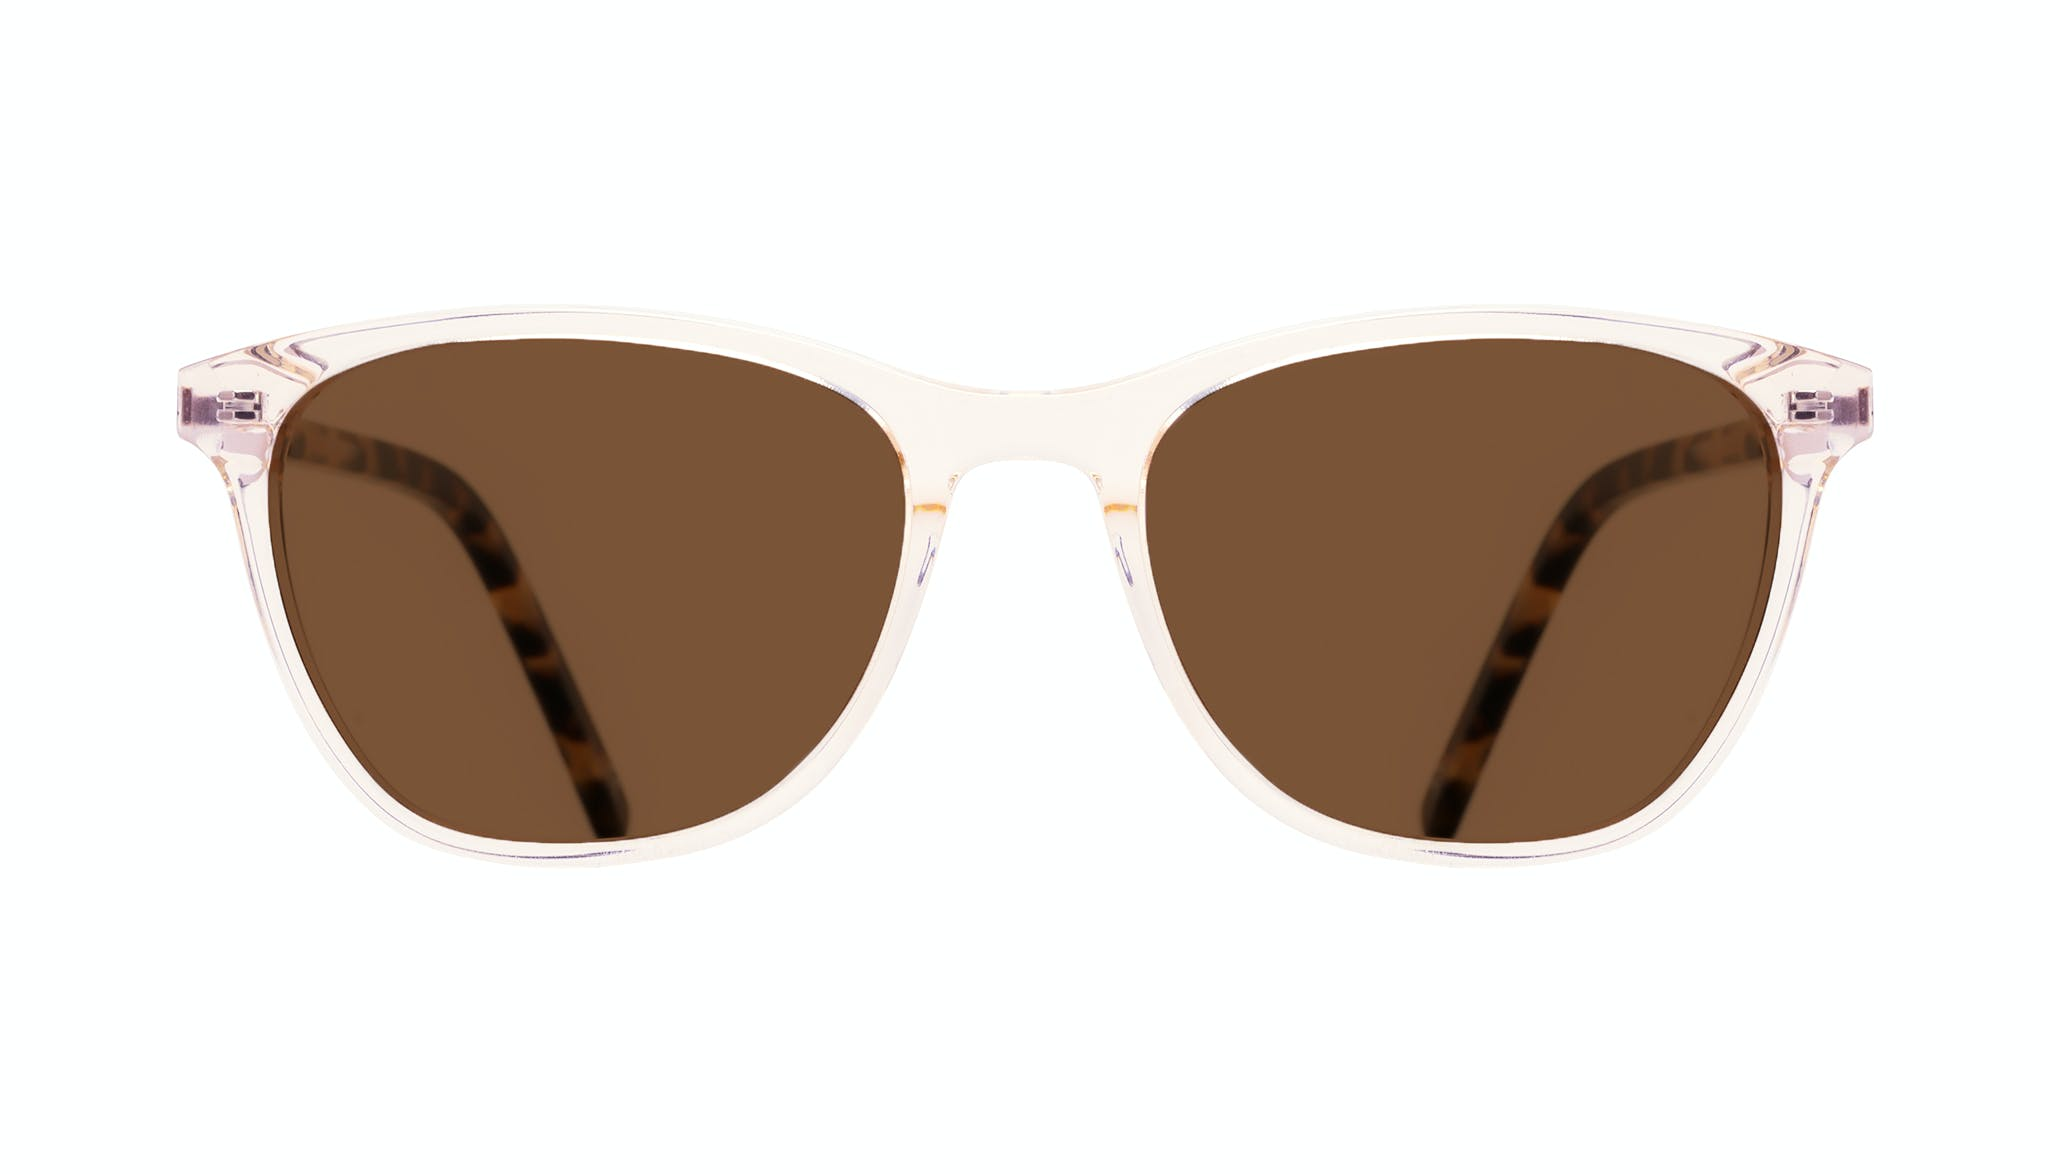 Affordable Fashion Glasses Cat Eye Rectangle Sunglasses Women Folk Blond Tortoise Front